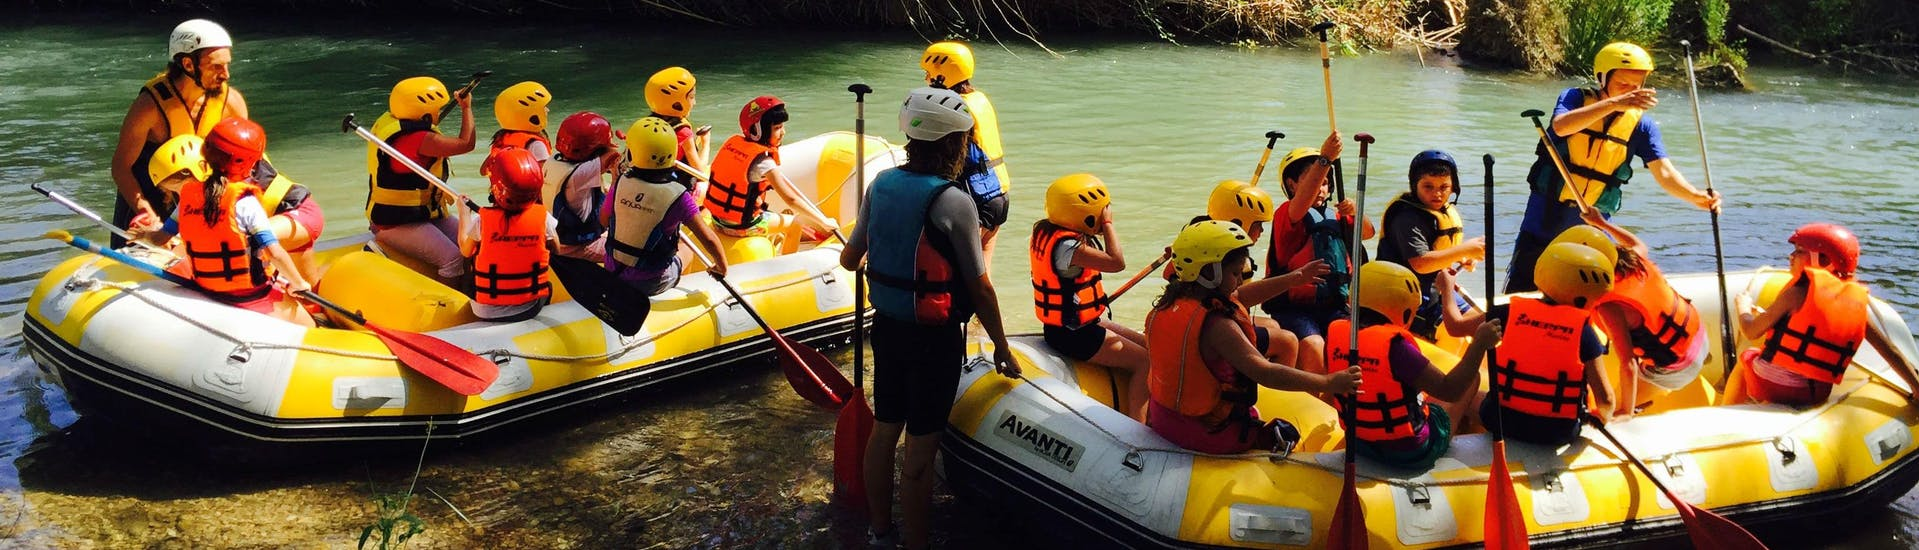 "Rafting ""Familia & Amigos"" - Río Turia"